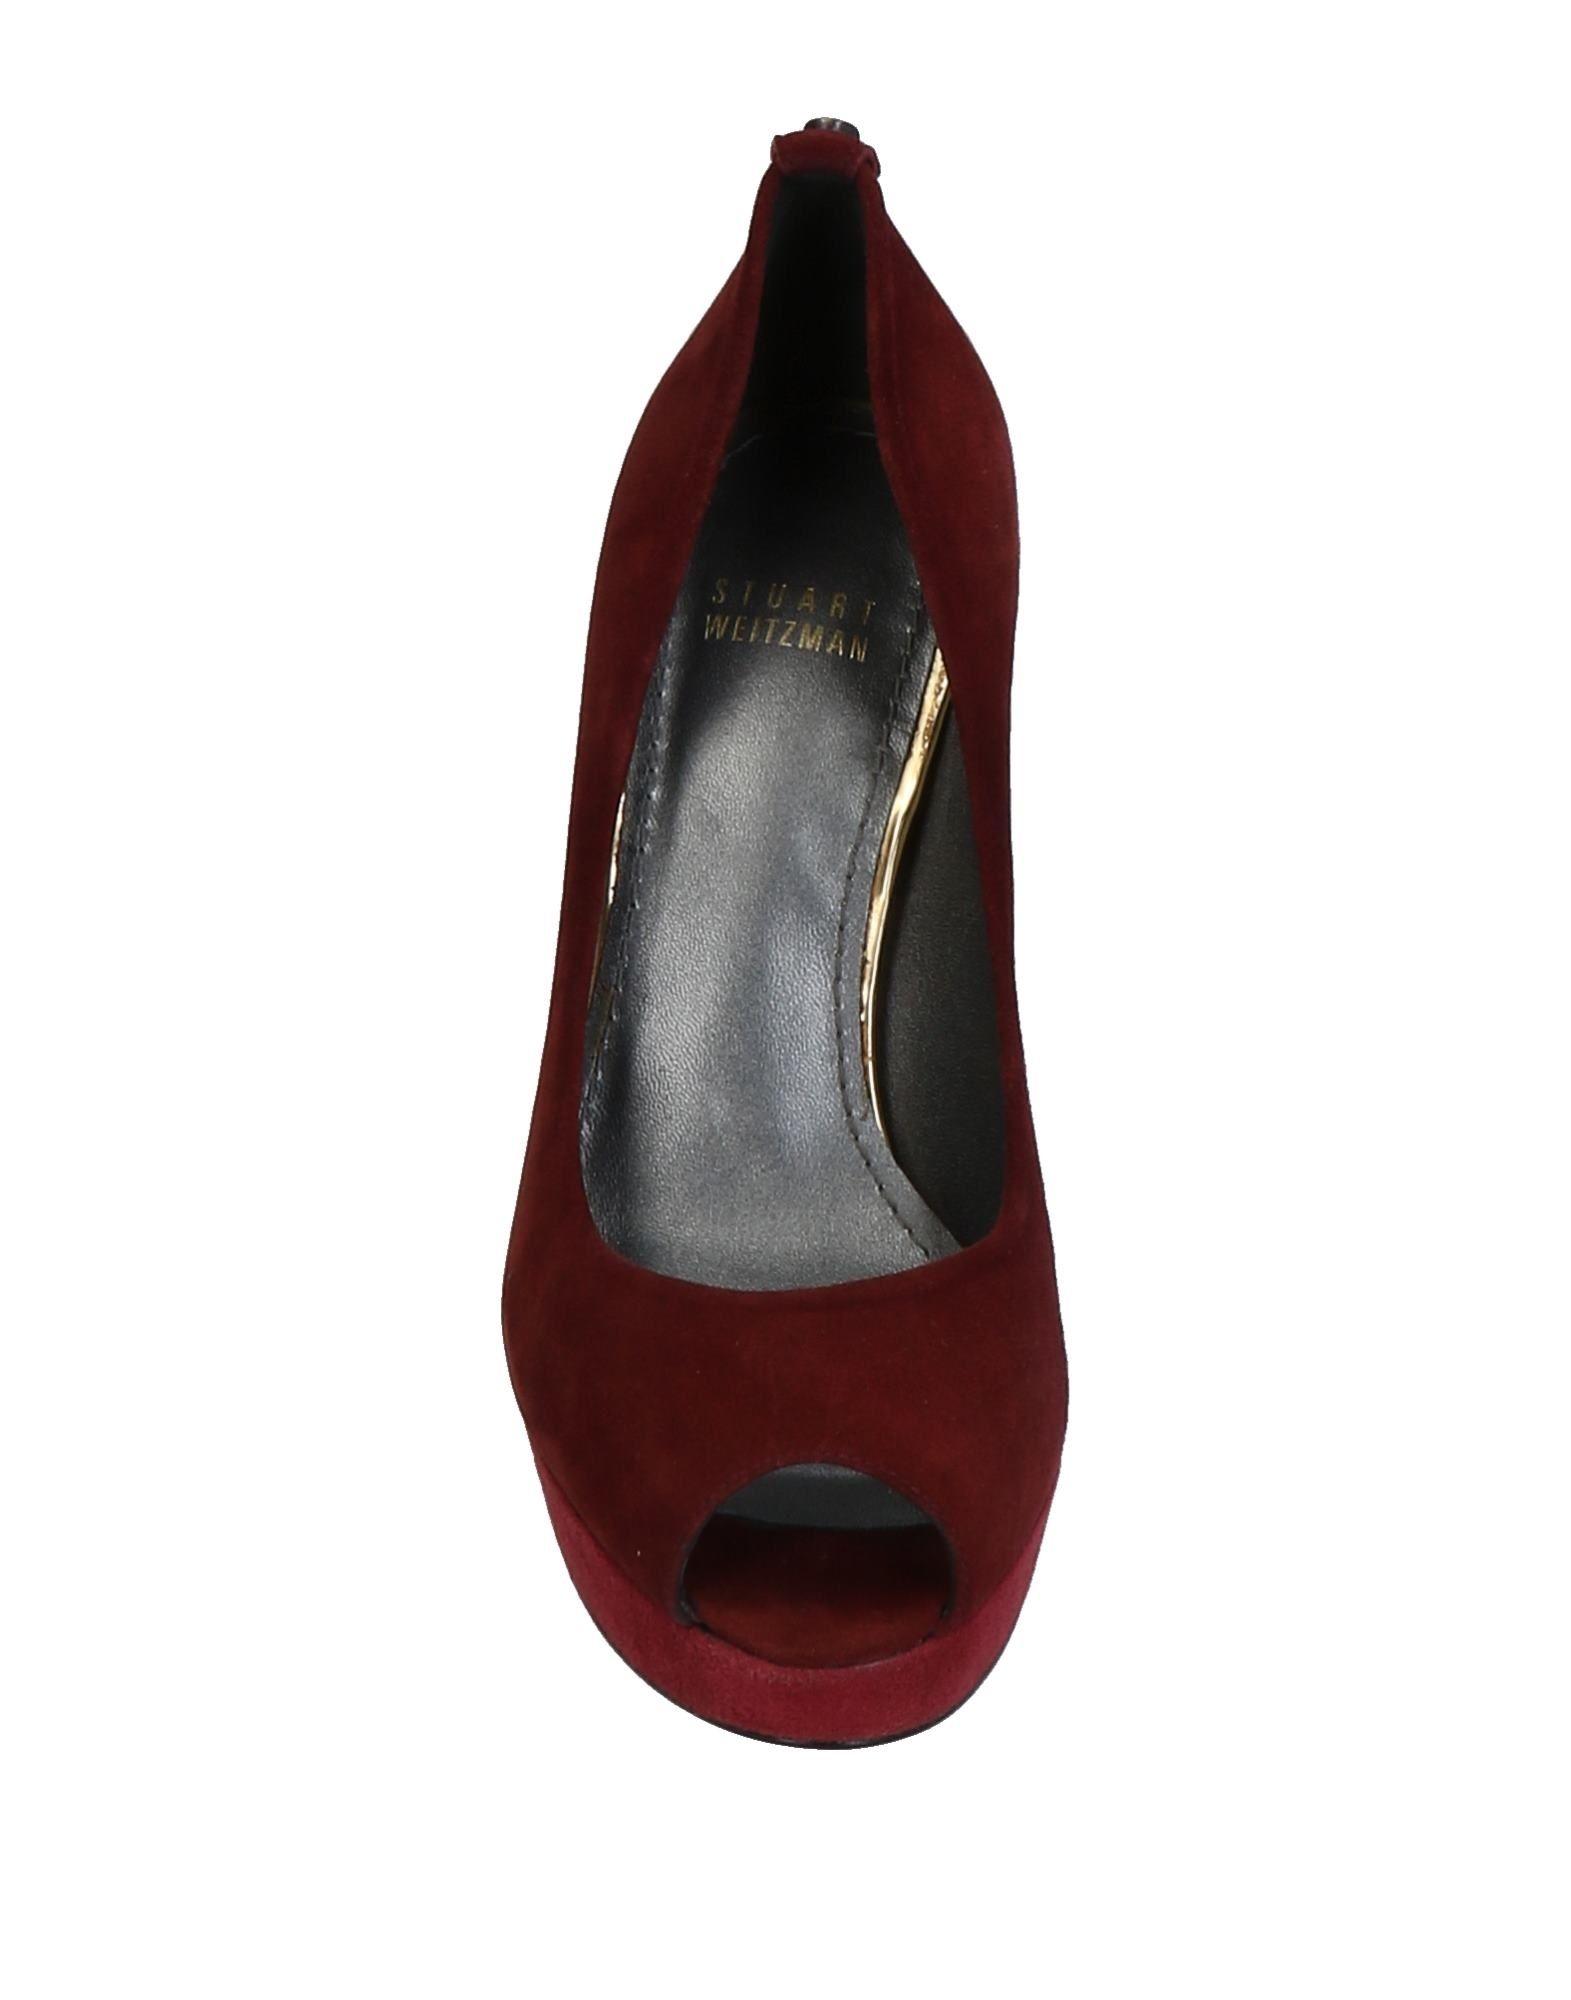 Gut um billige Schuhe Damen zu tragenStuart Weitzman Pumps Damen Schuhe  11451100LU 79e27c